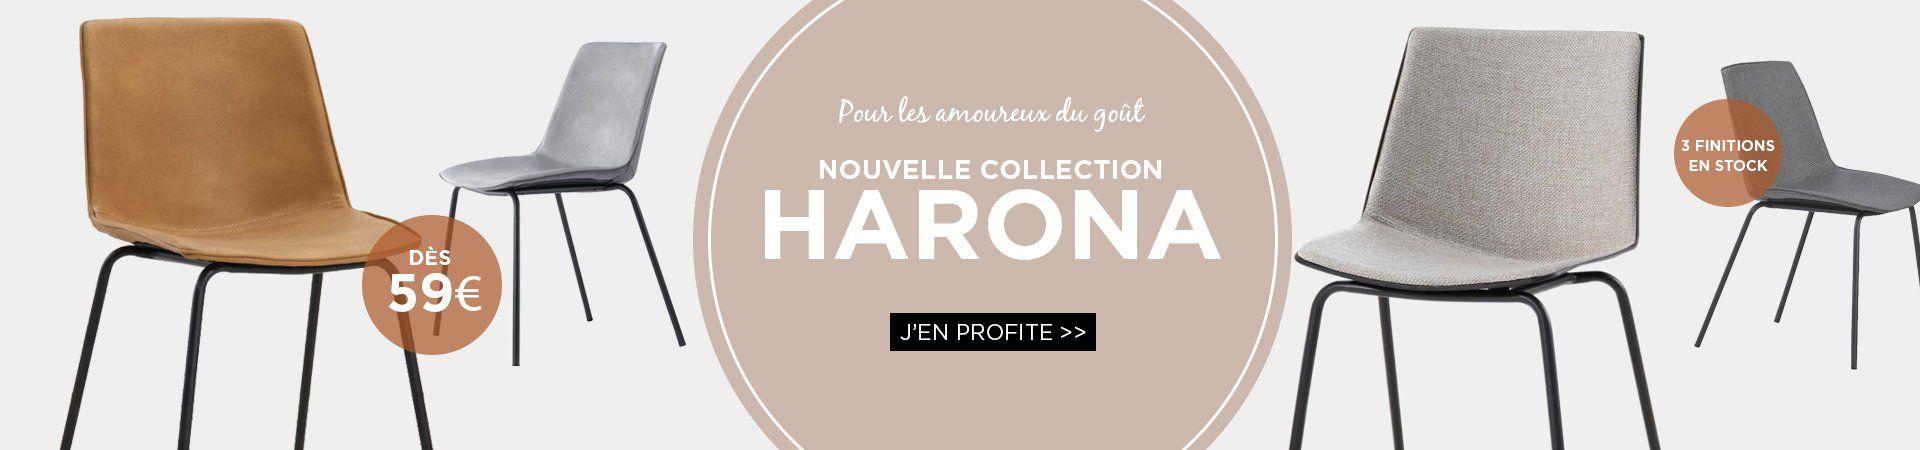 nouveau harona